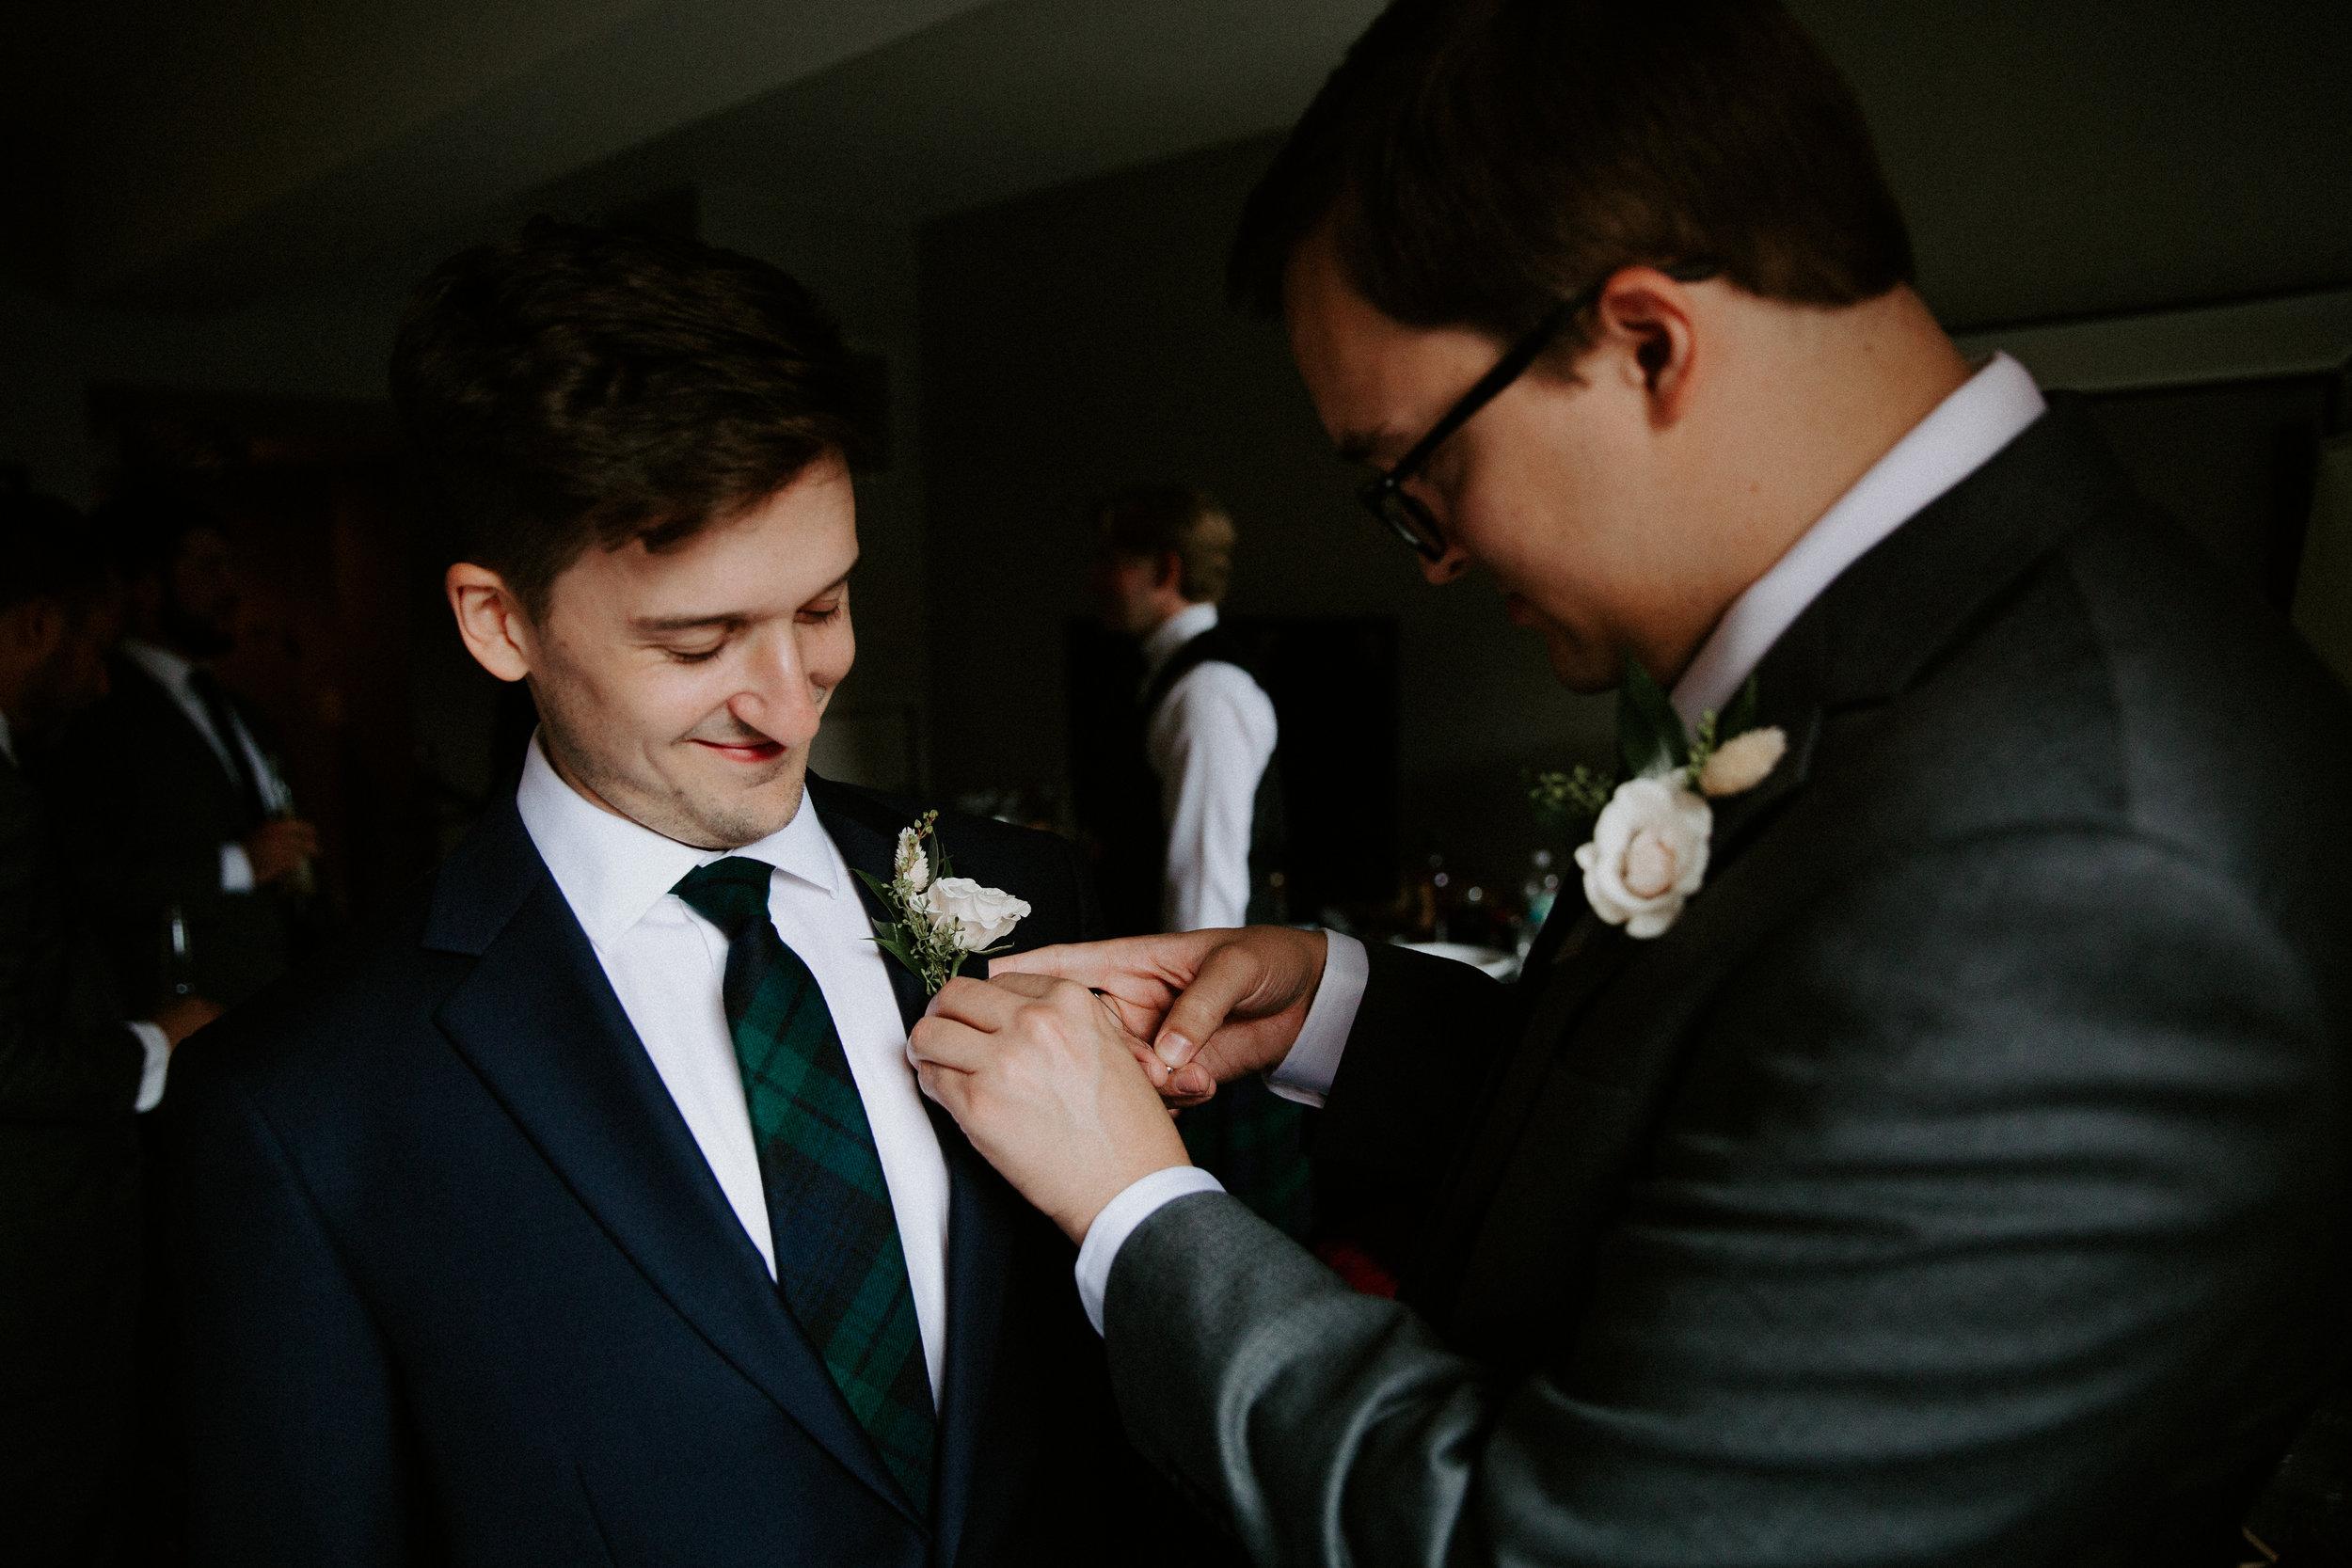 O_Maine-Studios-Portland-Maine-Wedding-EDIT-8.jpg